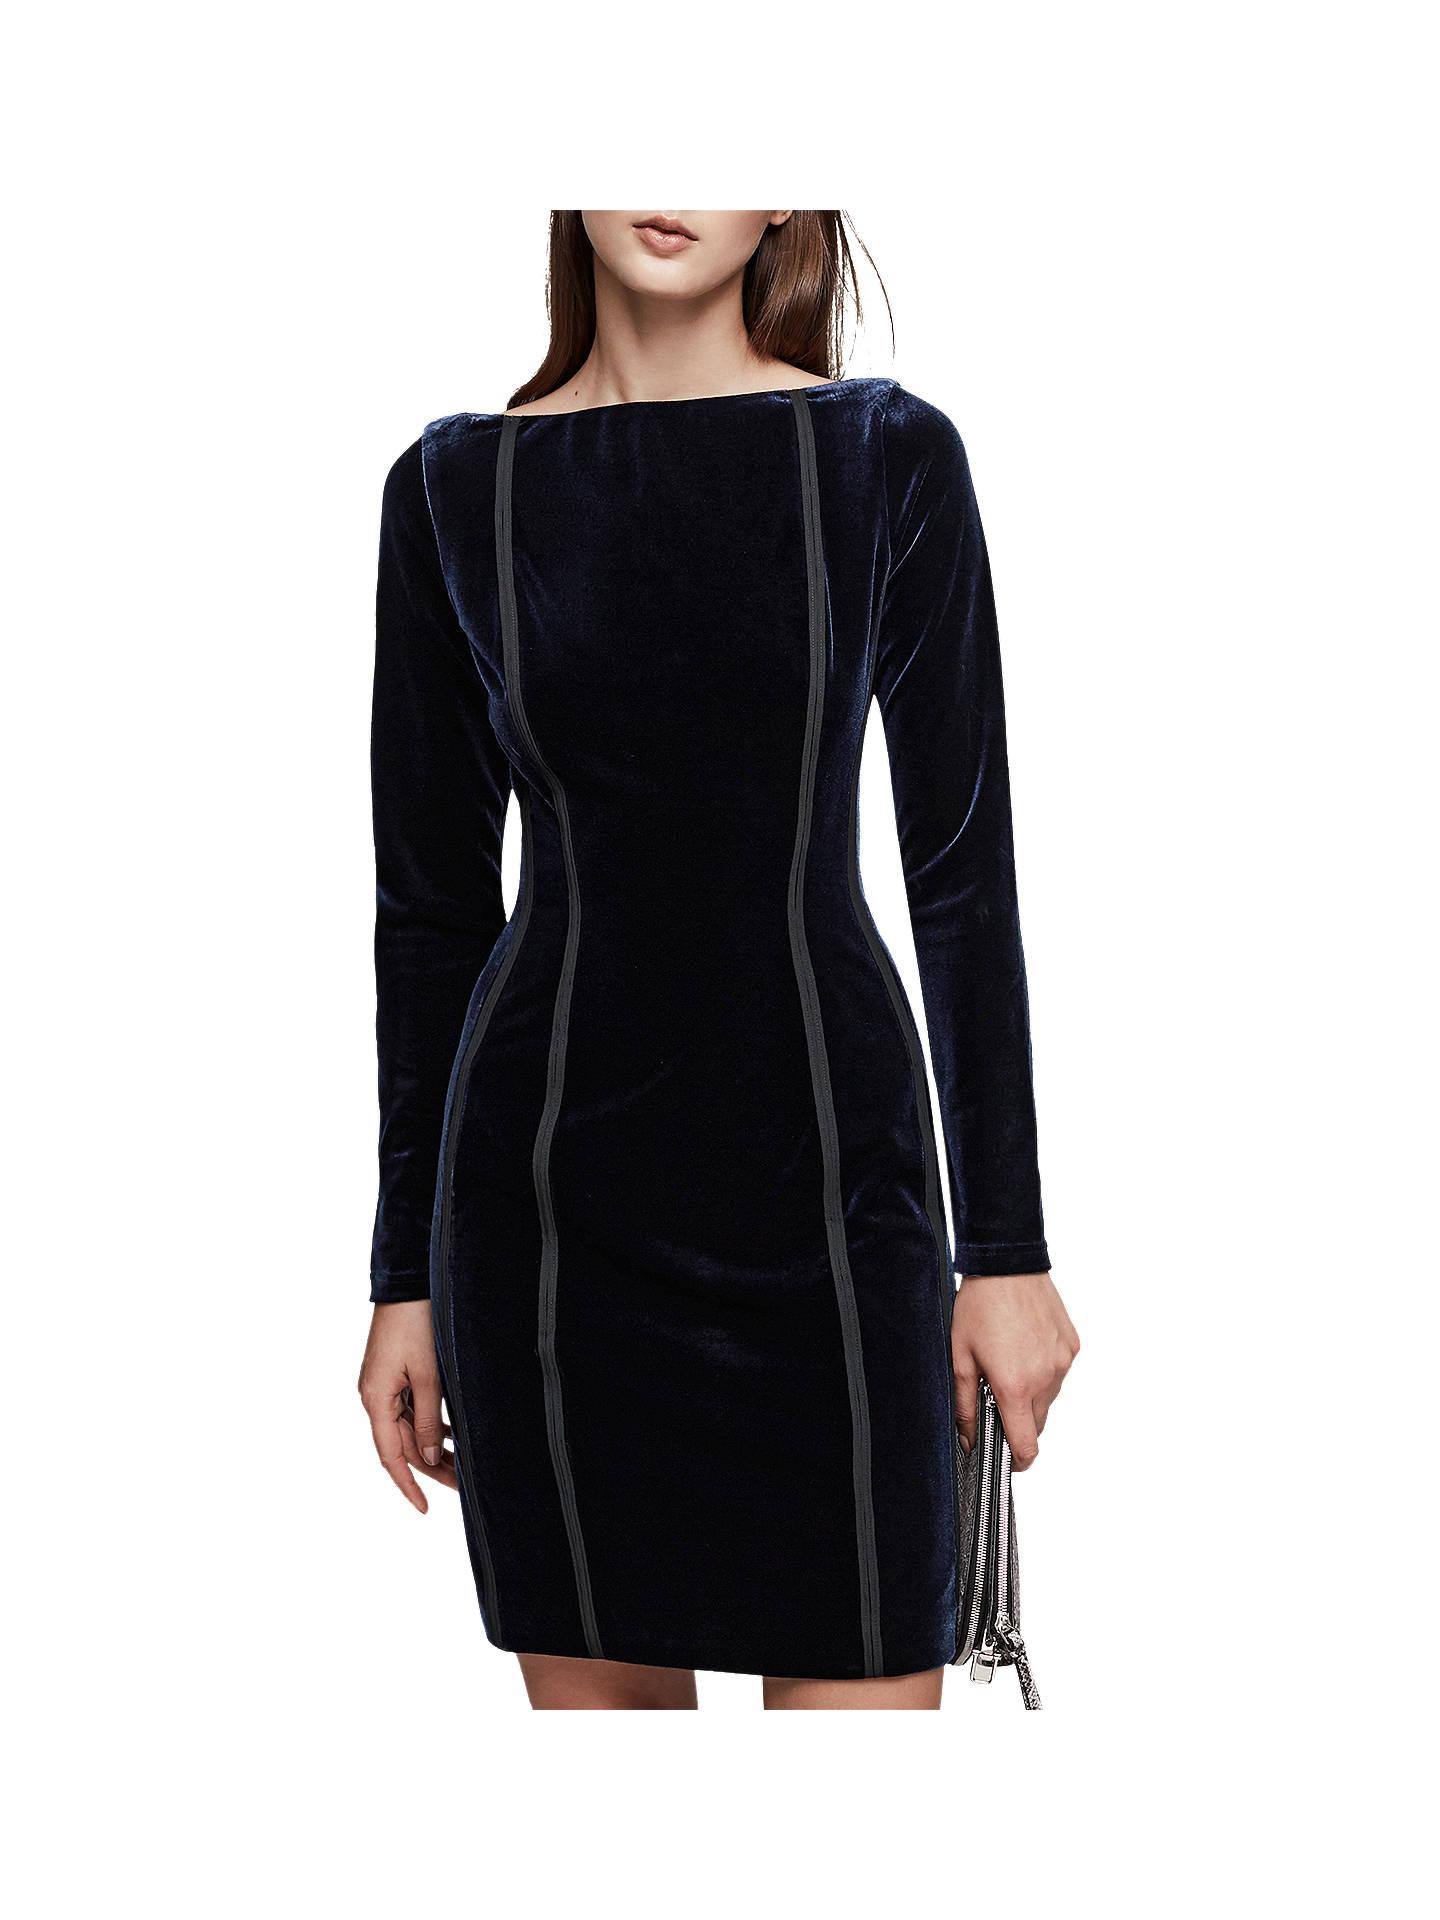 758157a887d Buy Reiss Xina Open Back Velvet Dress